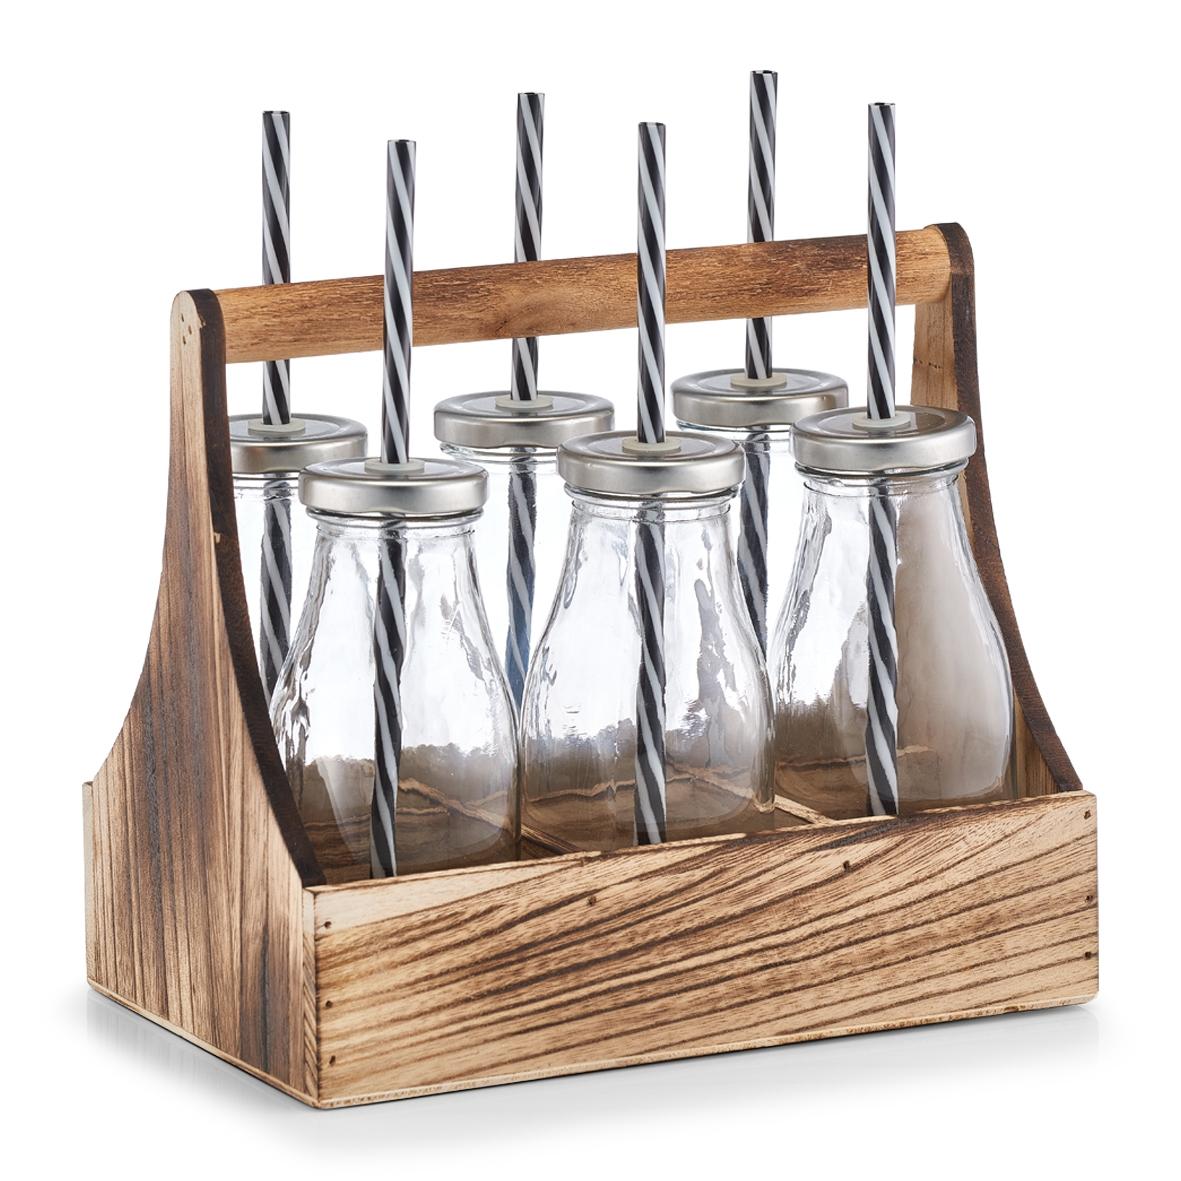 Set suport din lemn si sticle cu pai 7 piese